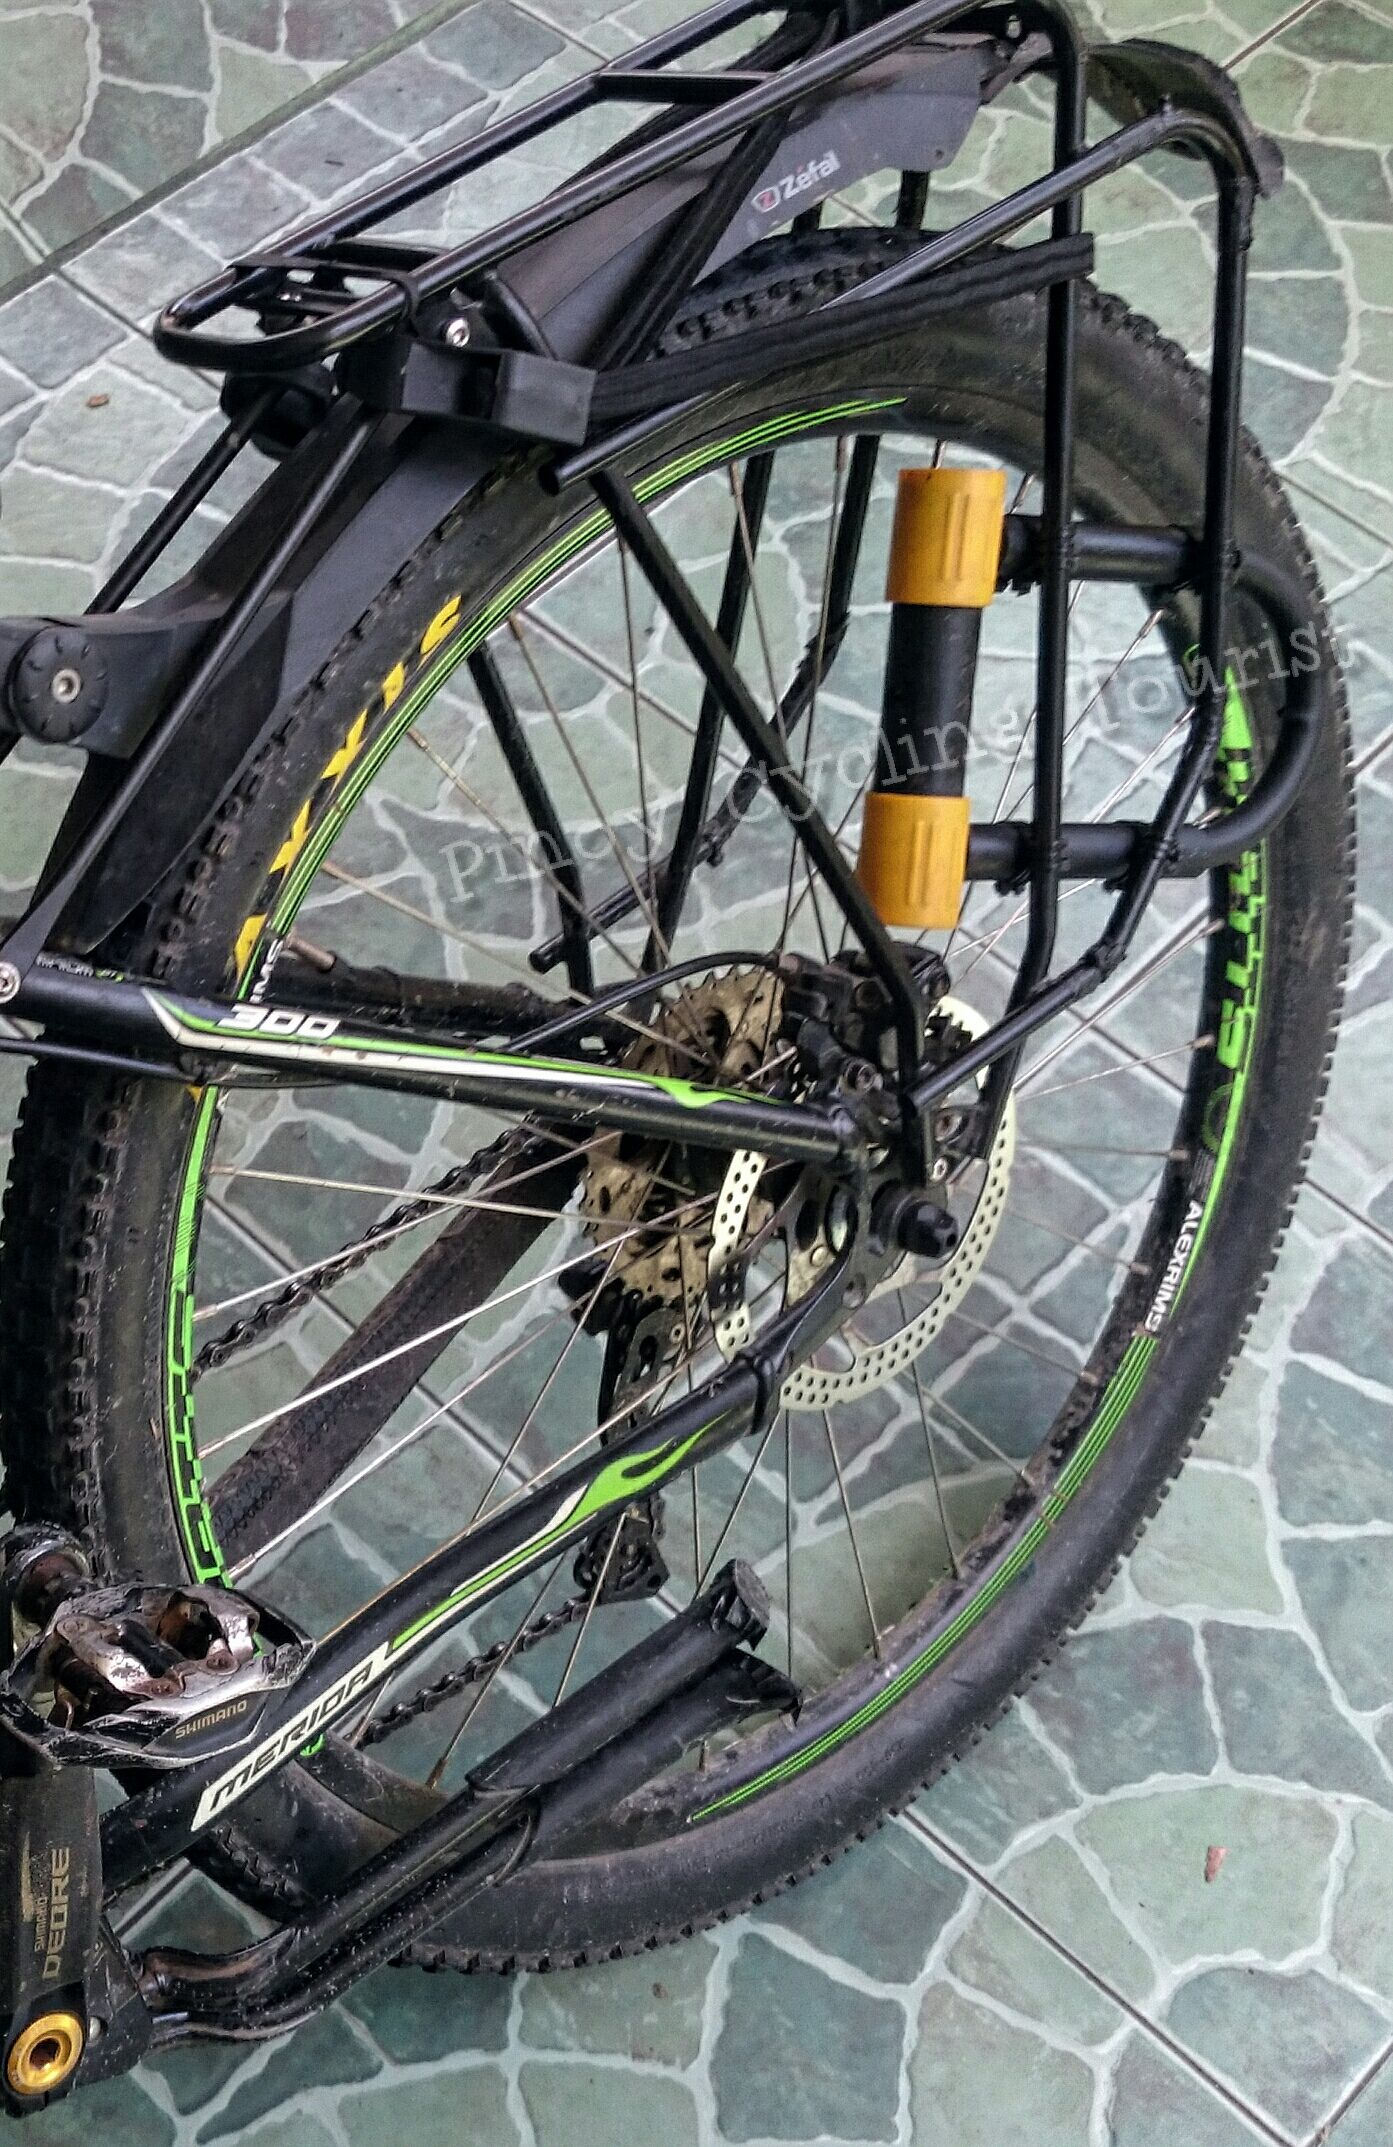 Diy U Lock Holster Source Fb Pinoy Cycling Tourist Bicycle